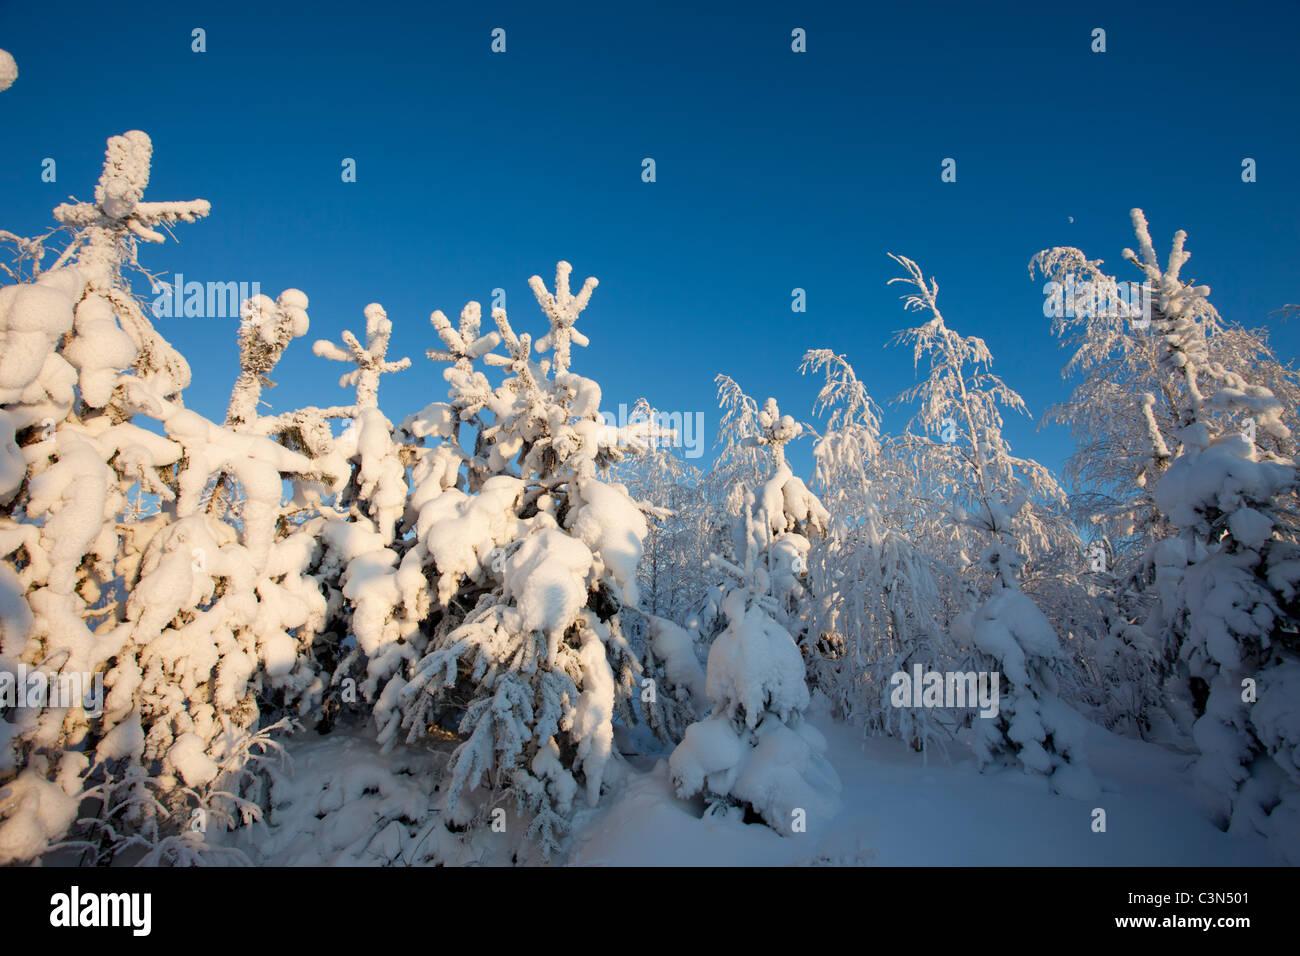 Snow covered pine ( pinus sylvestris ) tree saplings at Winter , Finland - Stock Image